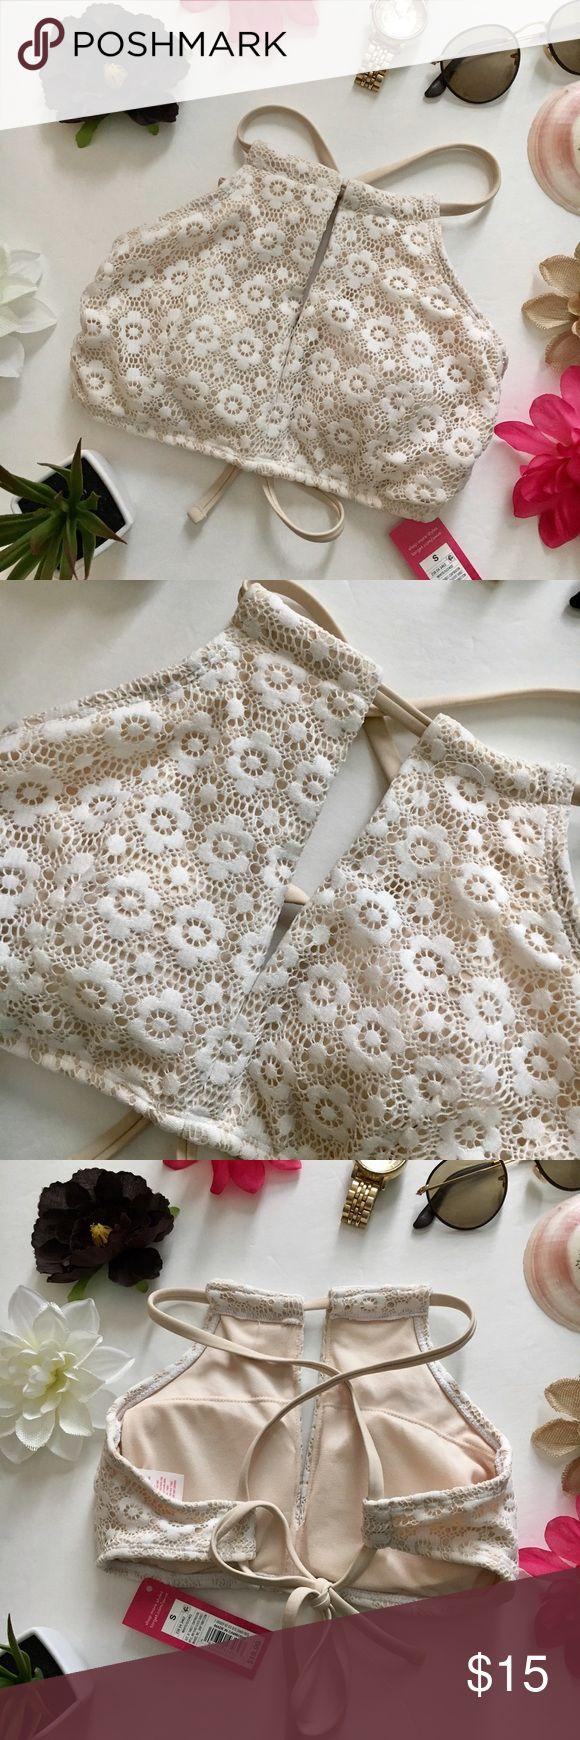 Xhilaration Cream Bikini Top New with tags! Very cute with some cream colored bottoms! Xhilaration Swim Bikinis